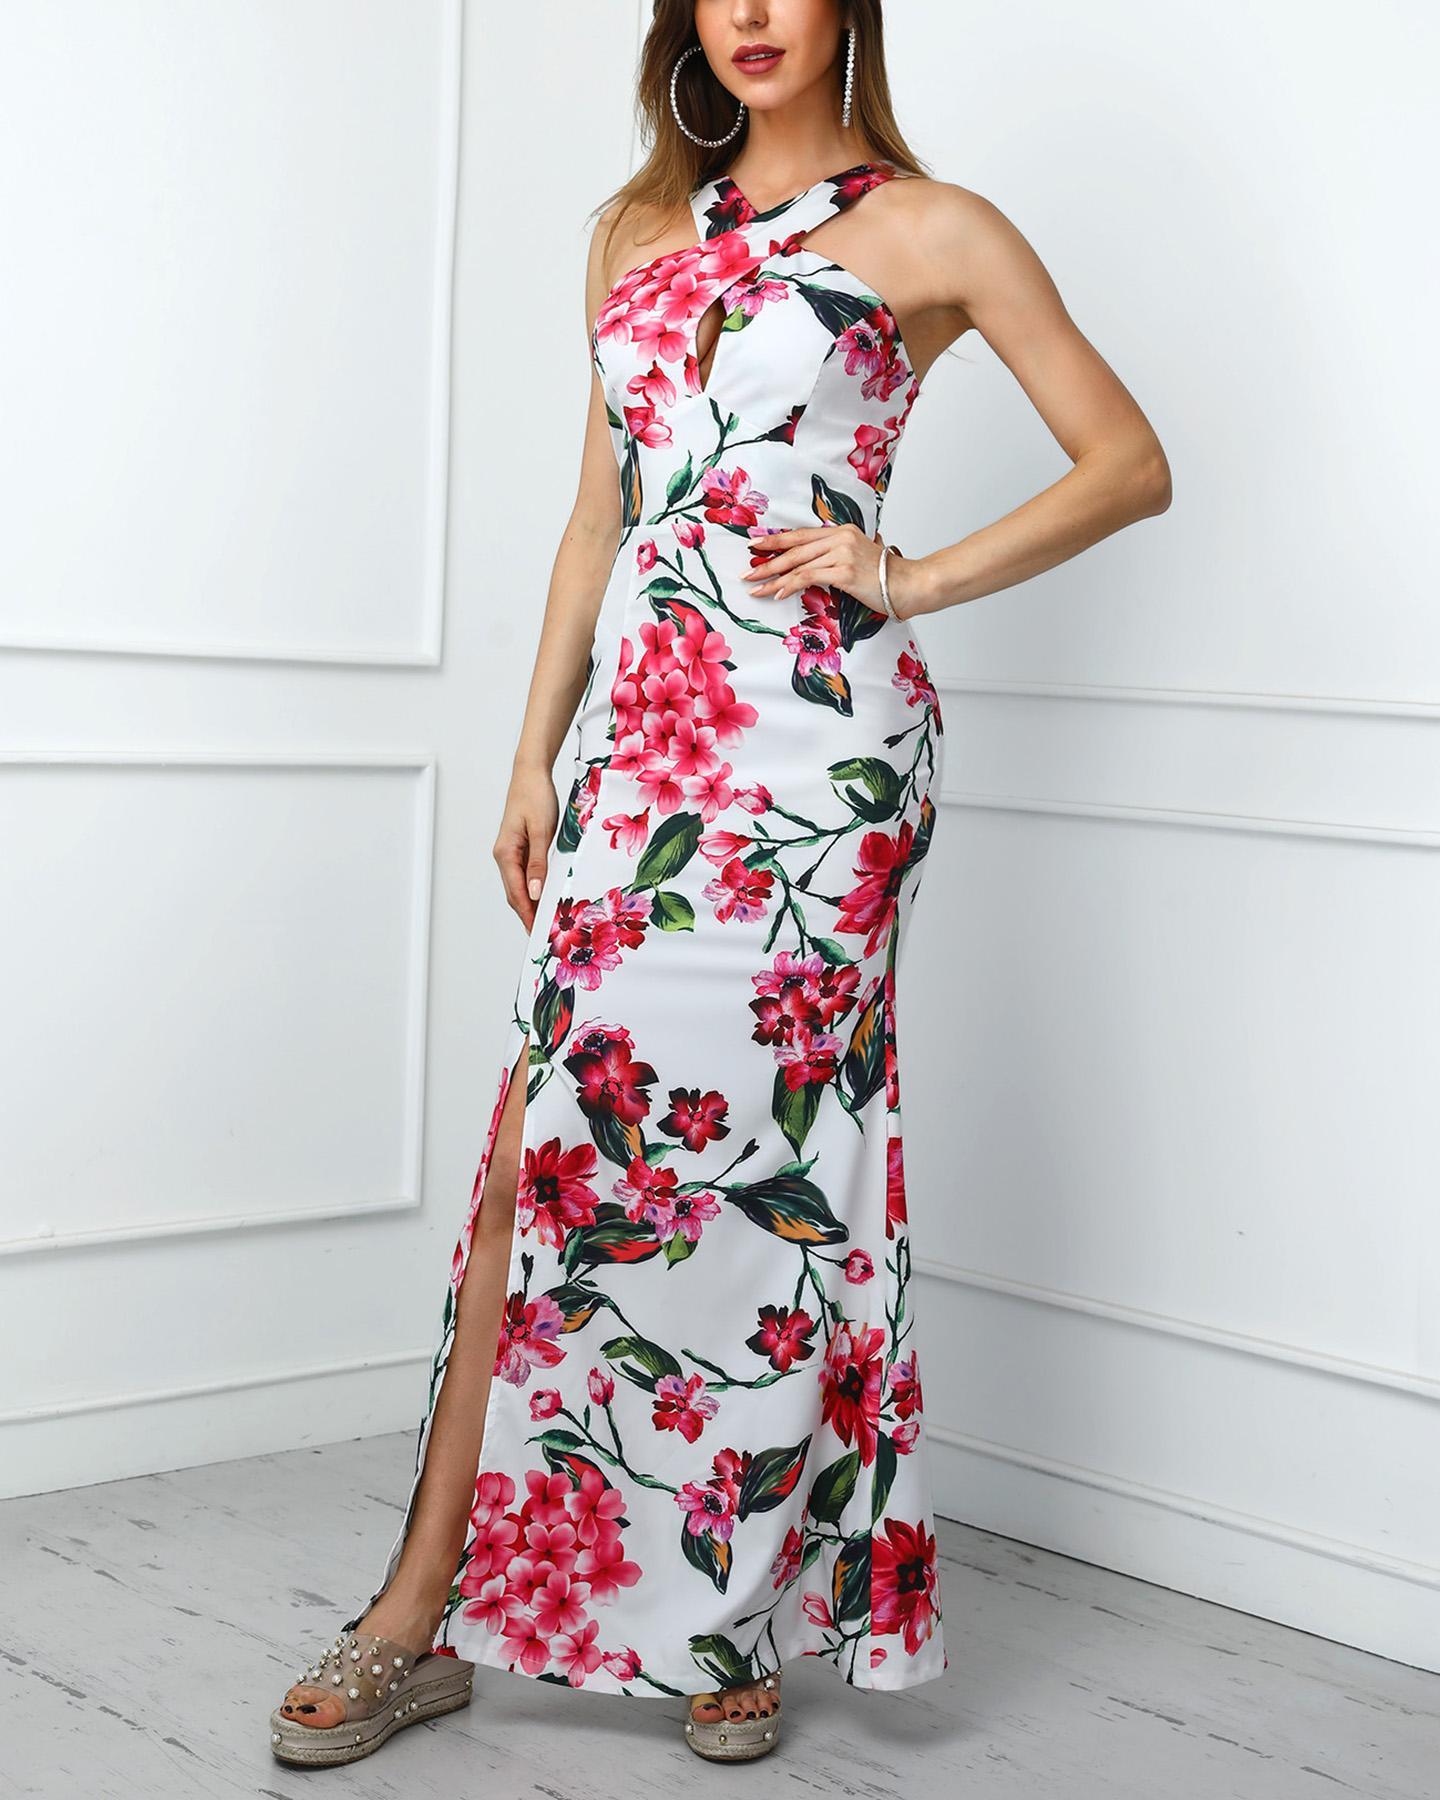 Floral Print Crisscross Neck Maxi Dress